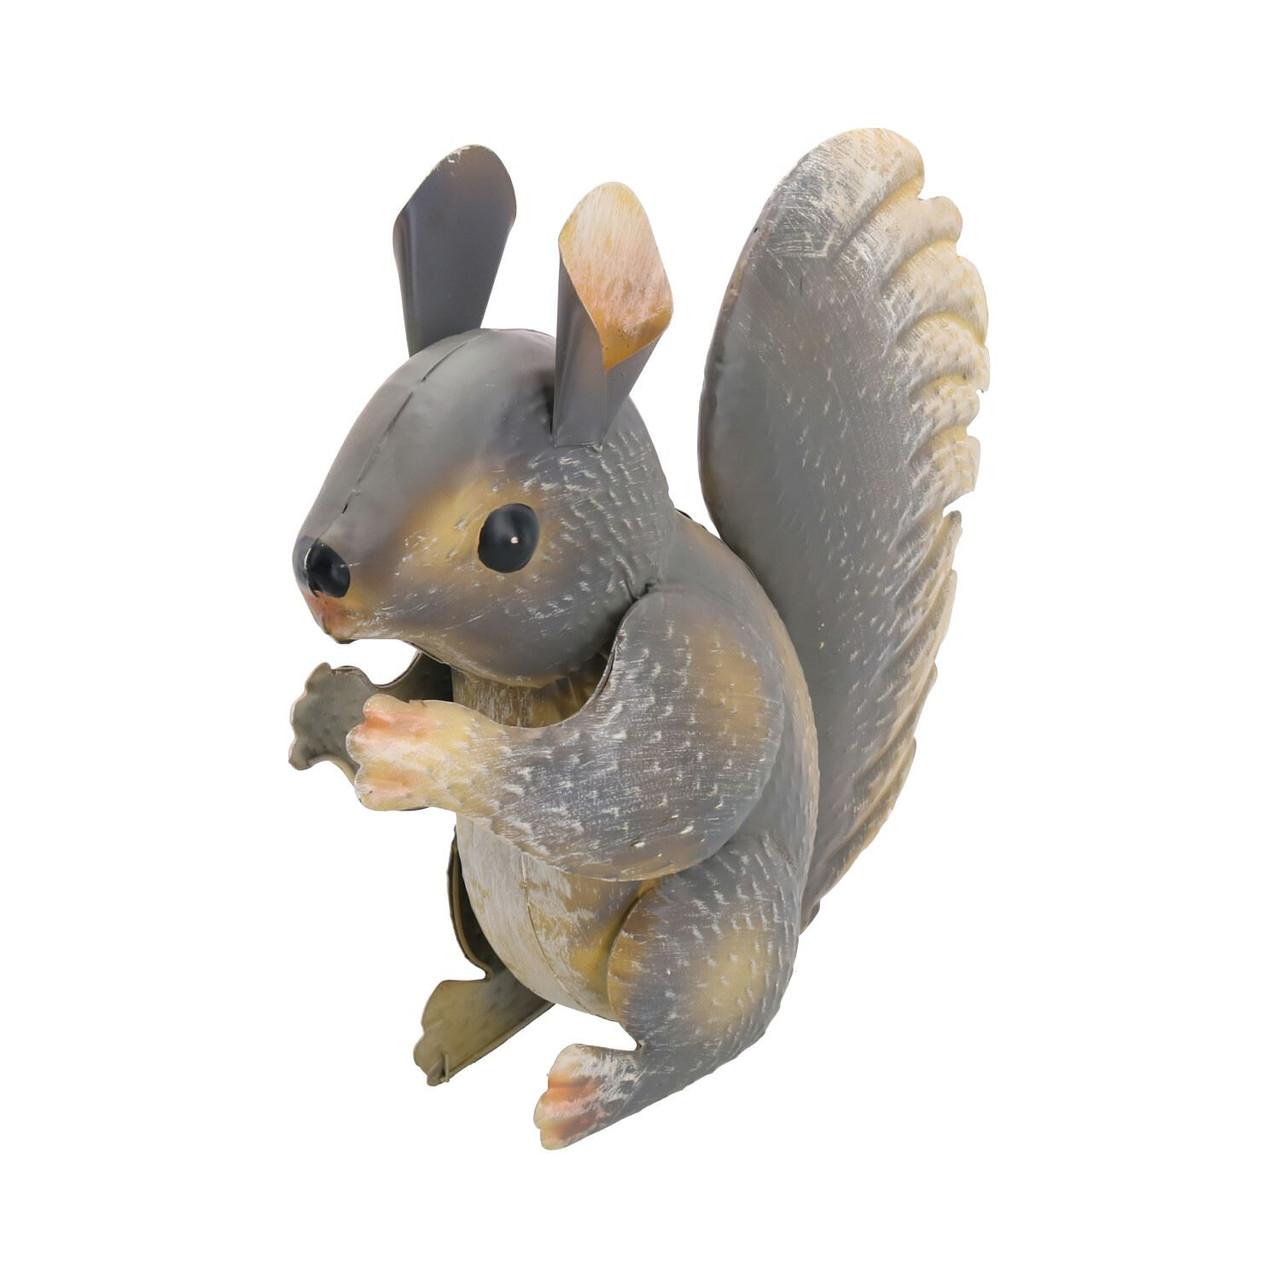 Grey Squirrel Garden Sculpture Ornament Statue Metal Decoration Animal Lawn